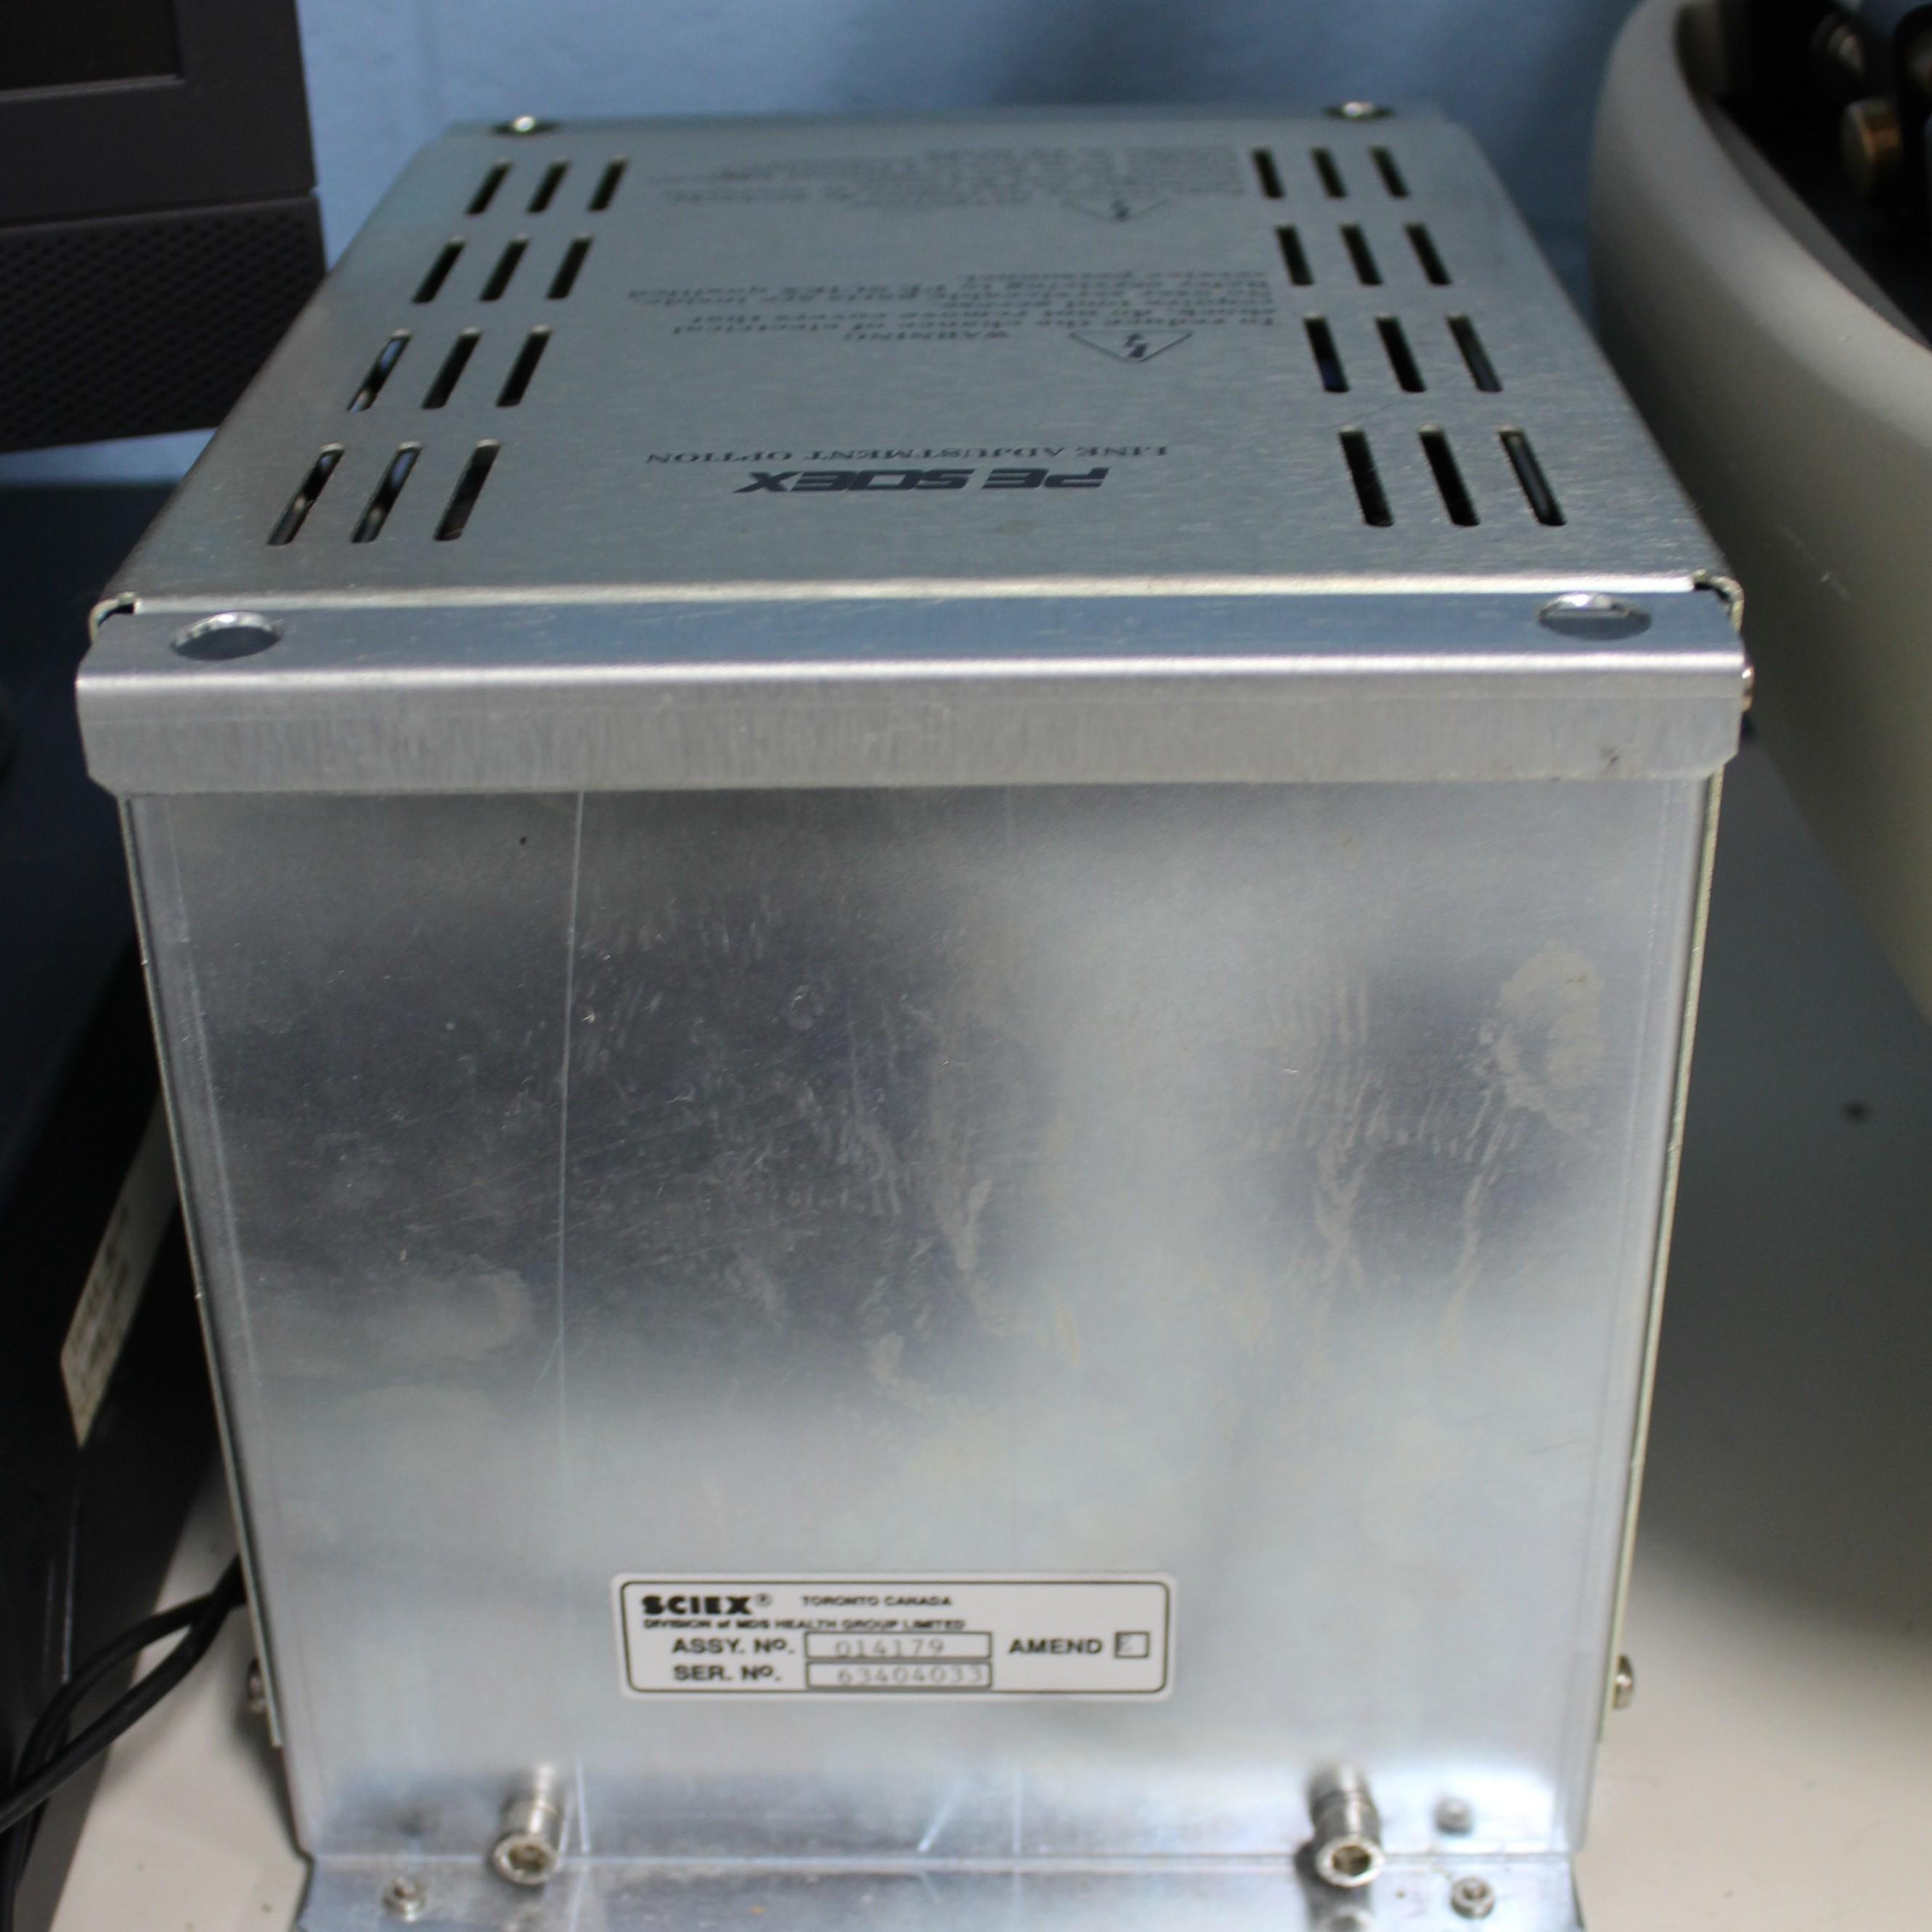 ABI MDS Sciex QTrap (027170) LC/MS/MS  System Image